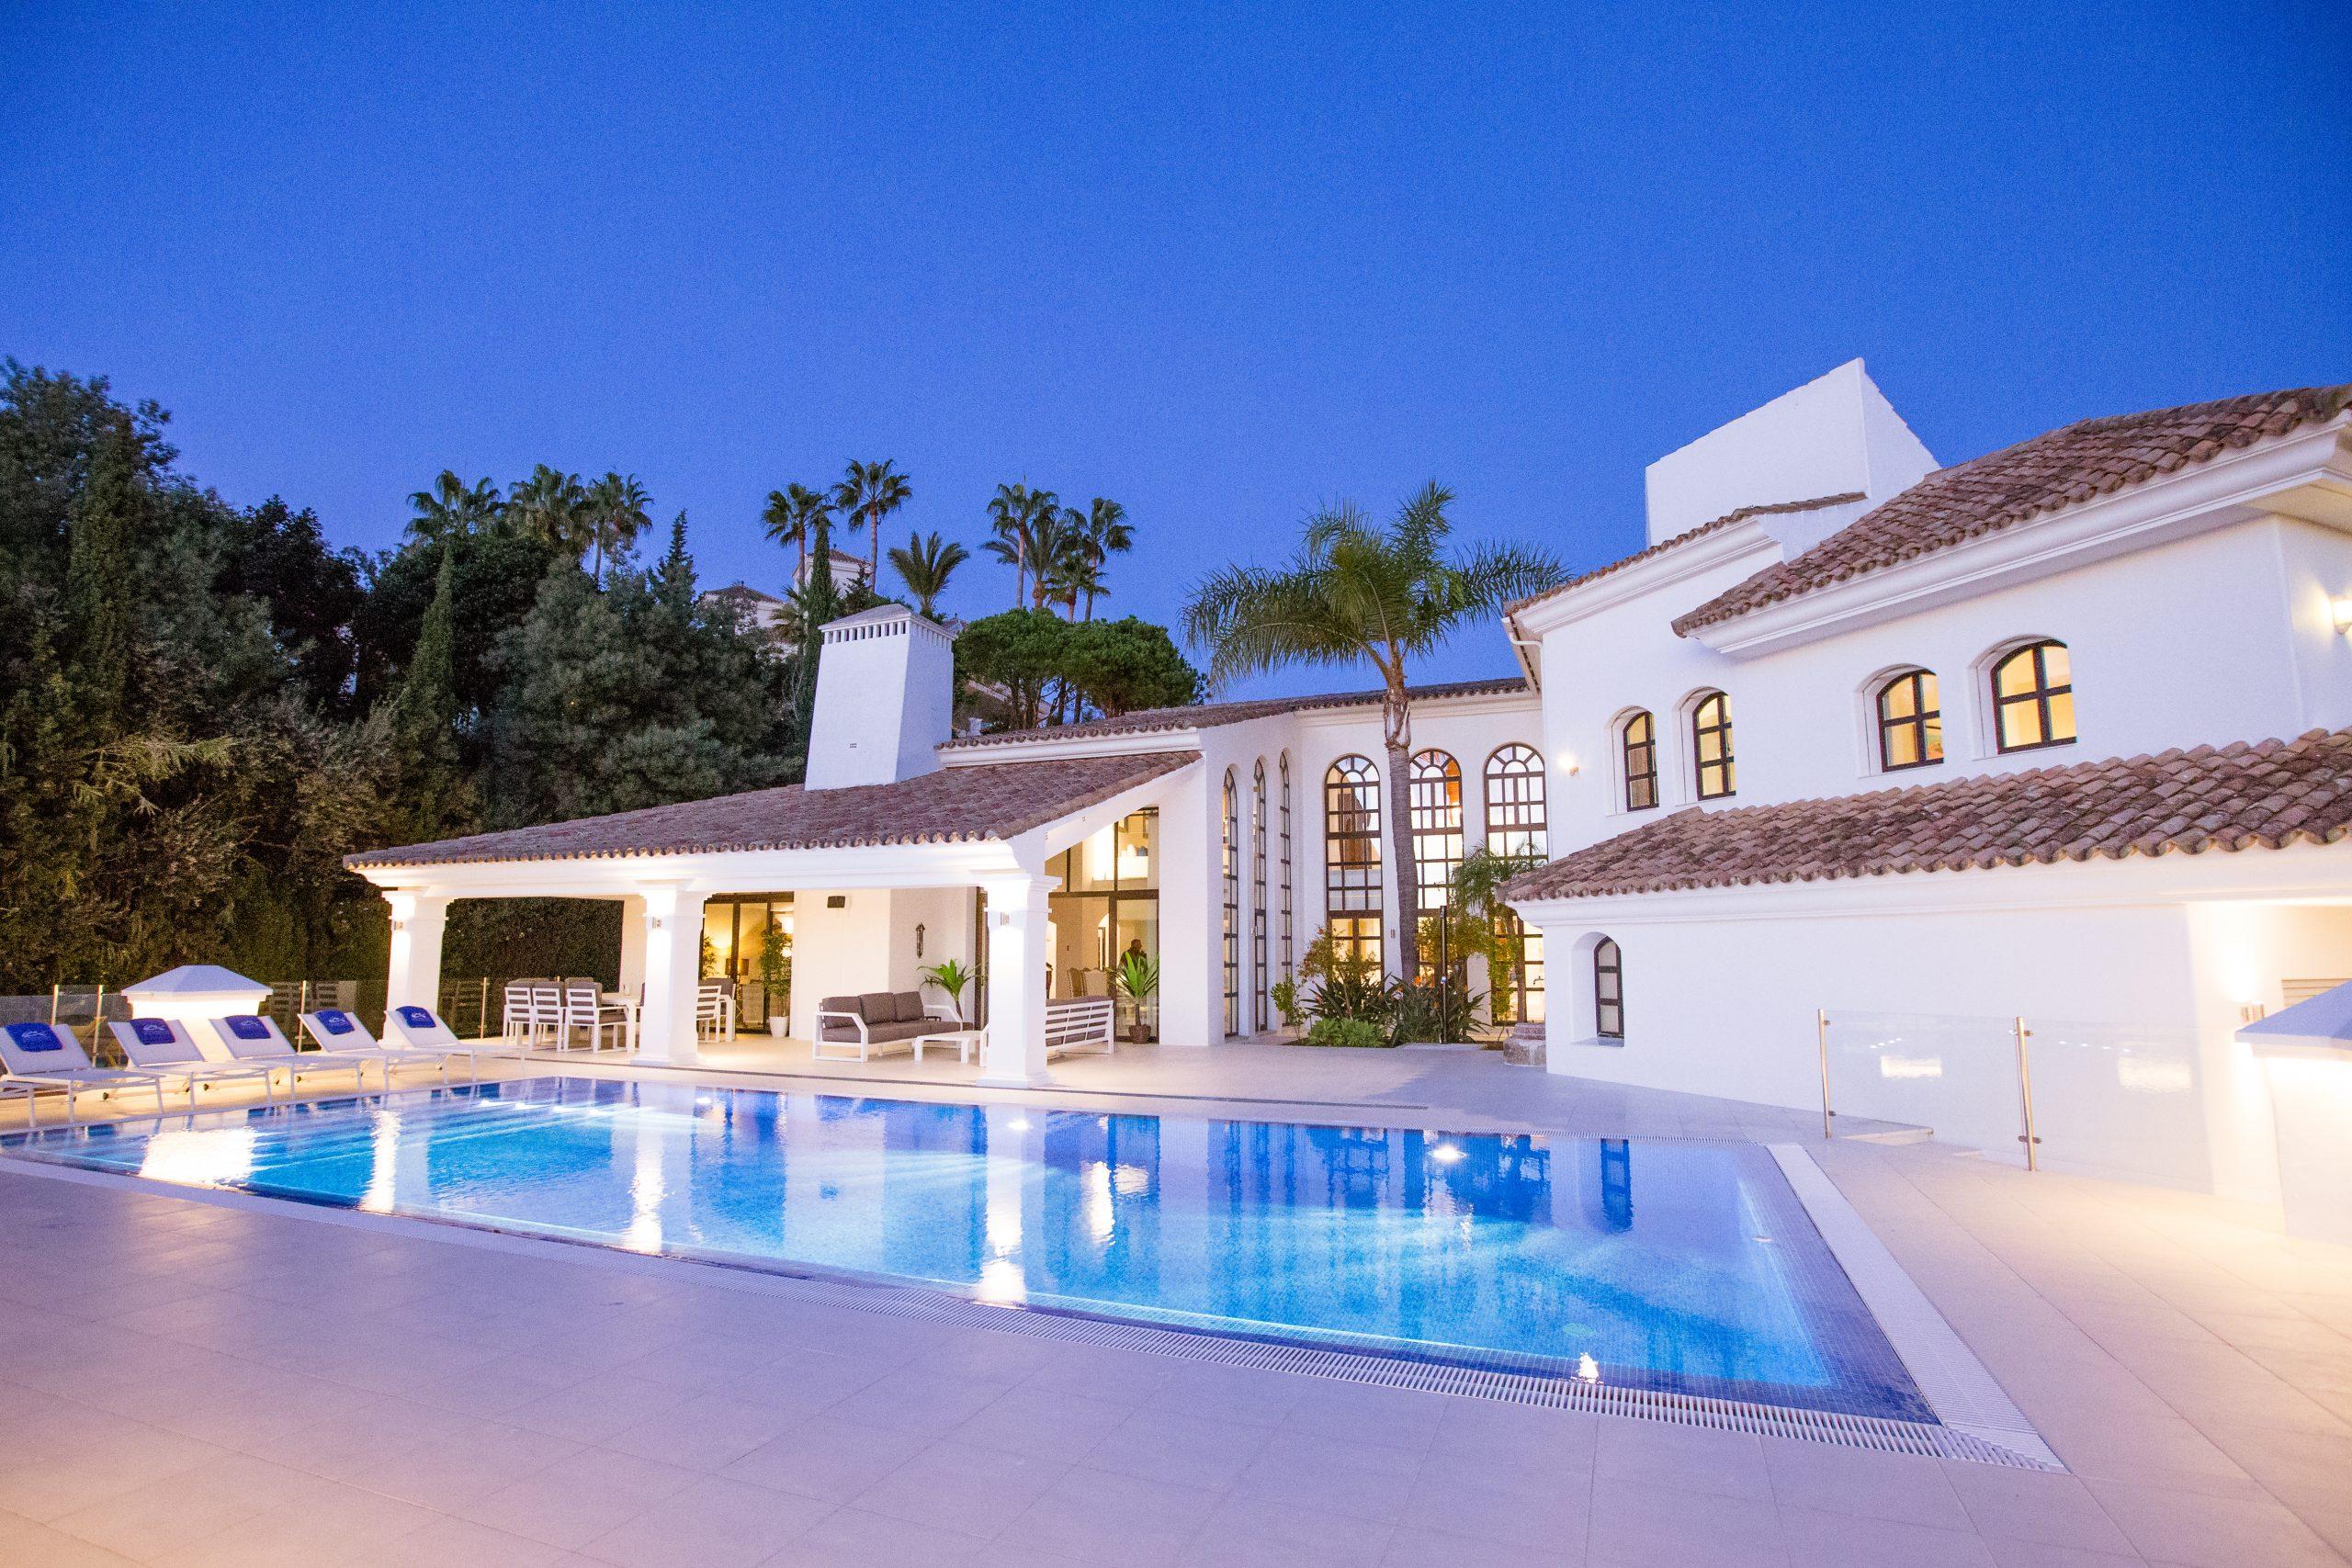 El Farolero – Luxury with never ending views